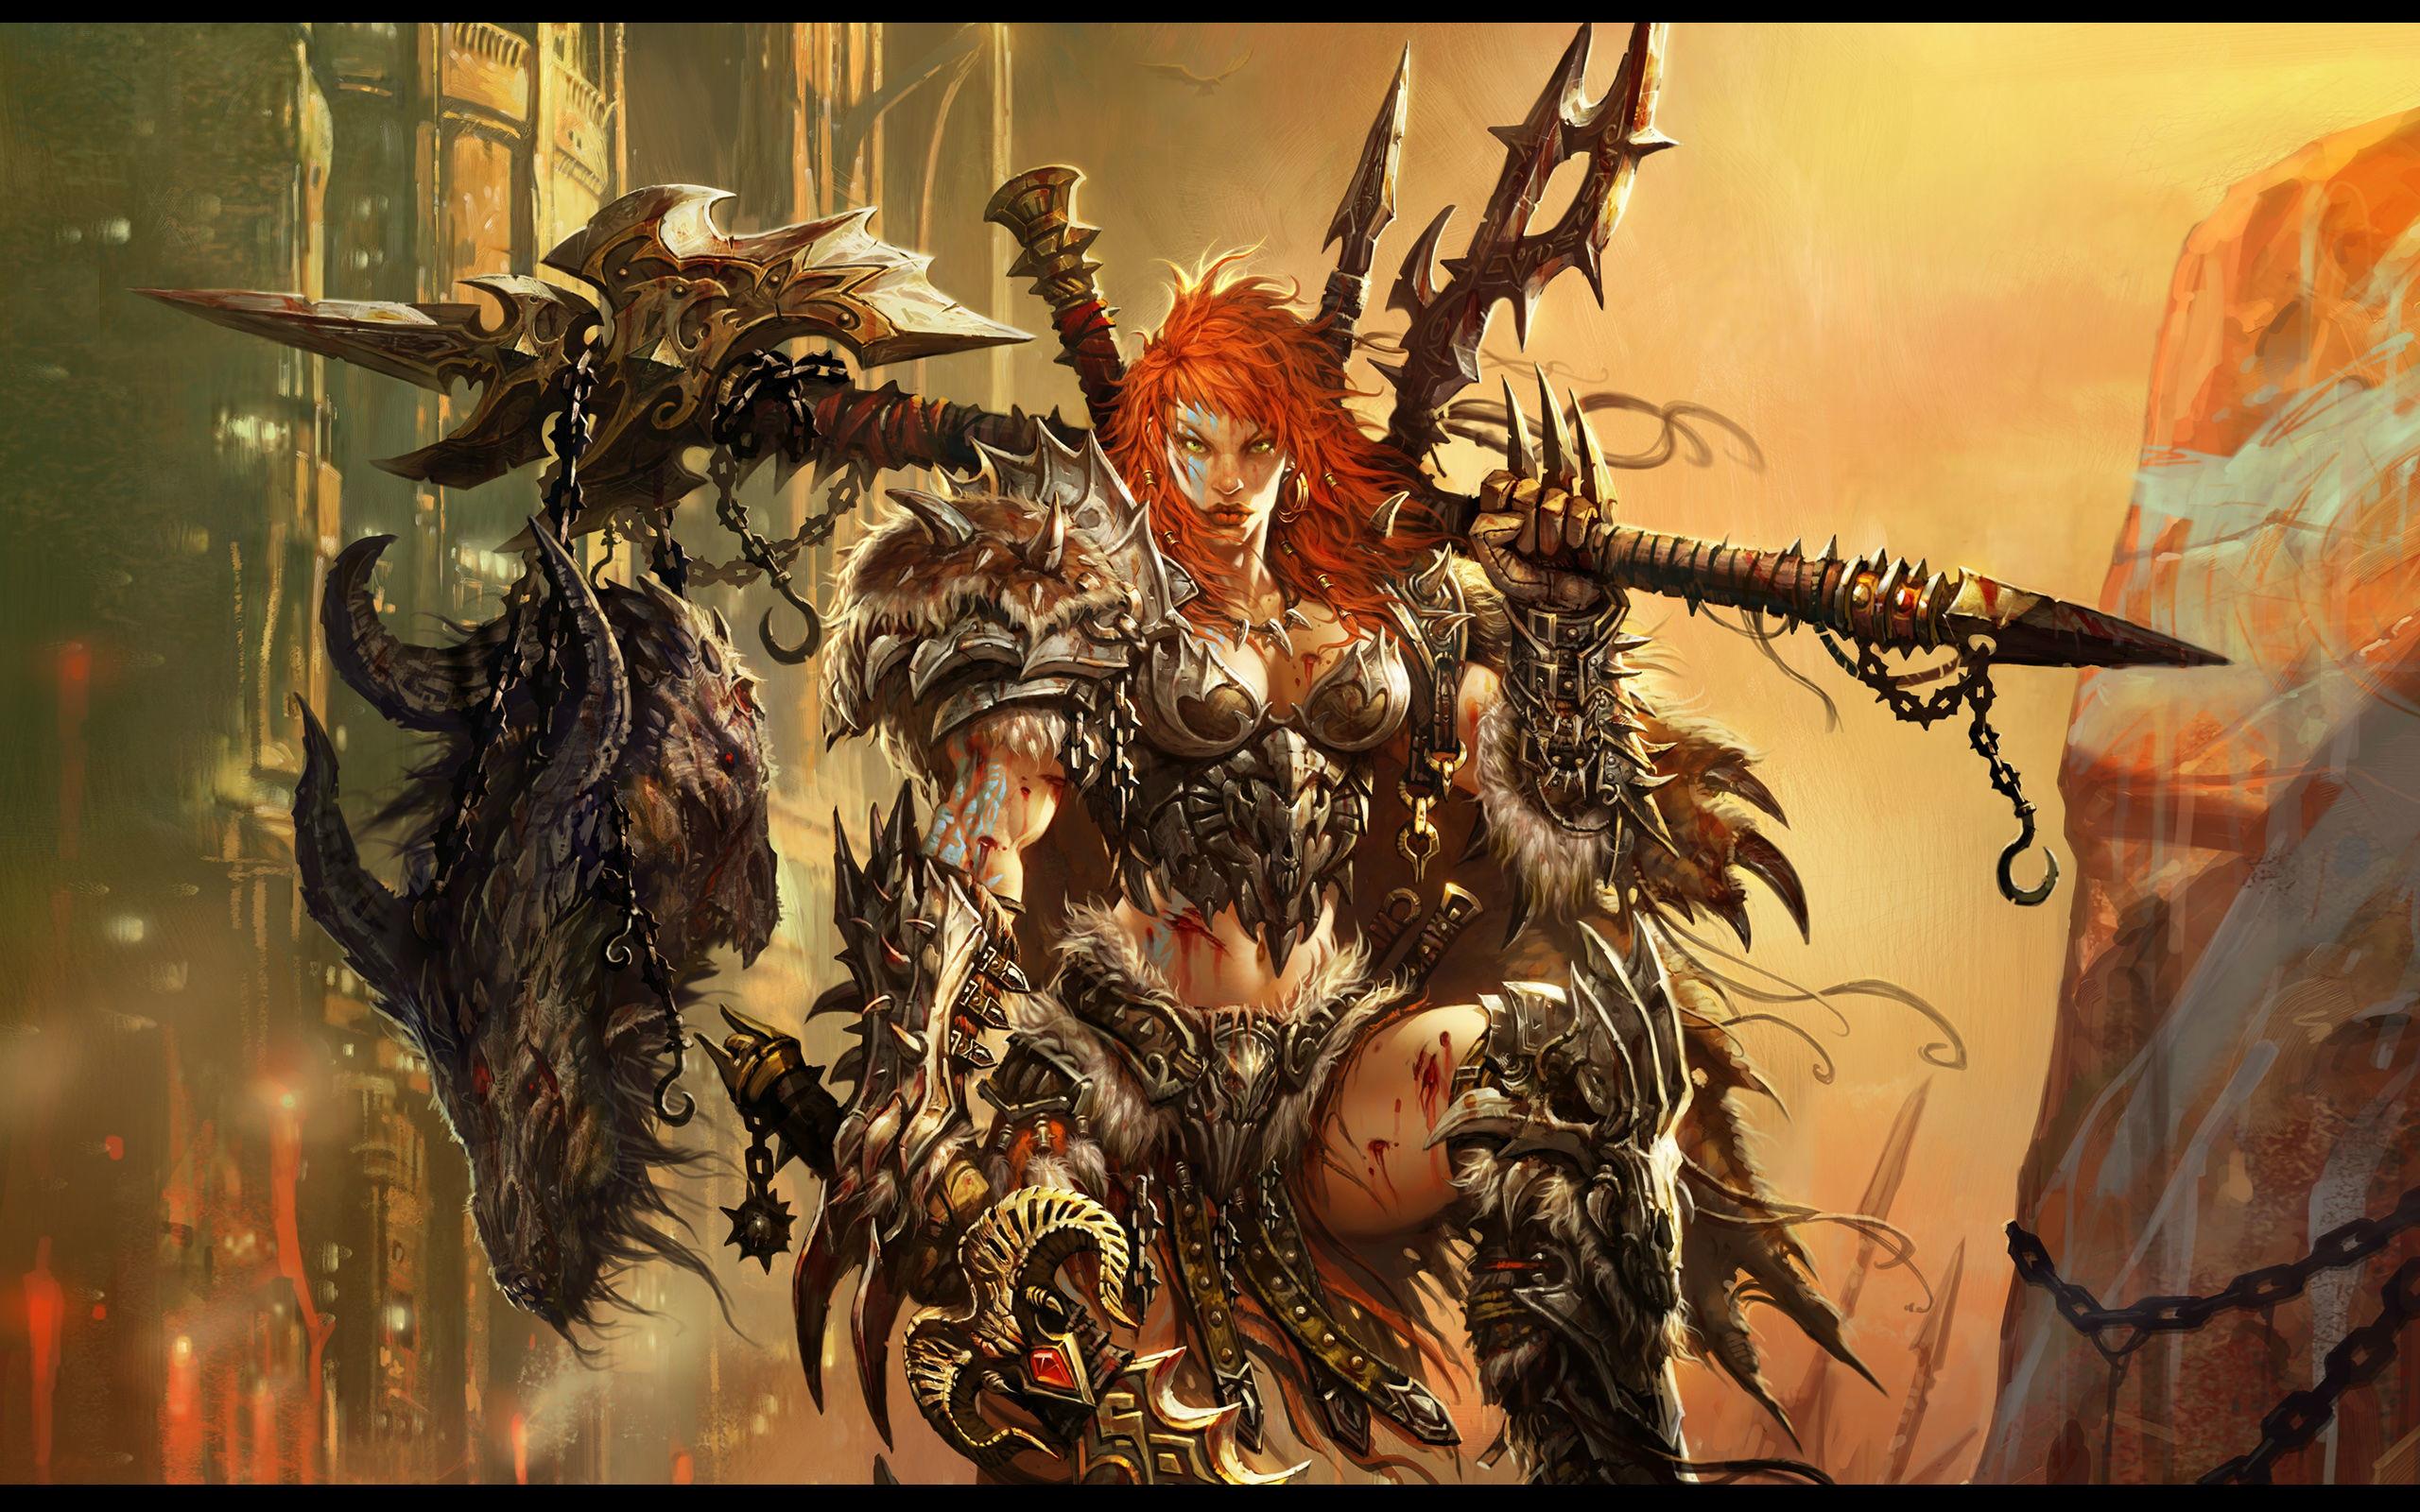 Diablo 3 Wallpaper 1920x1080: Diablo 3 Barbarian Wallpaper 1920x1080 ·① WallpaperTag